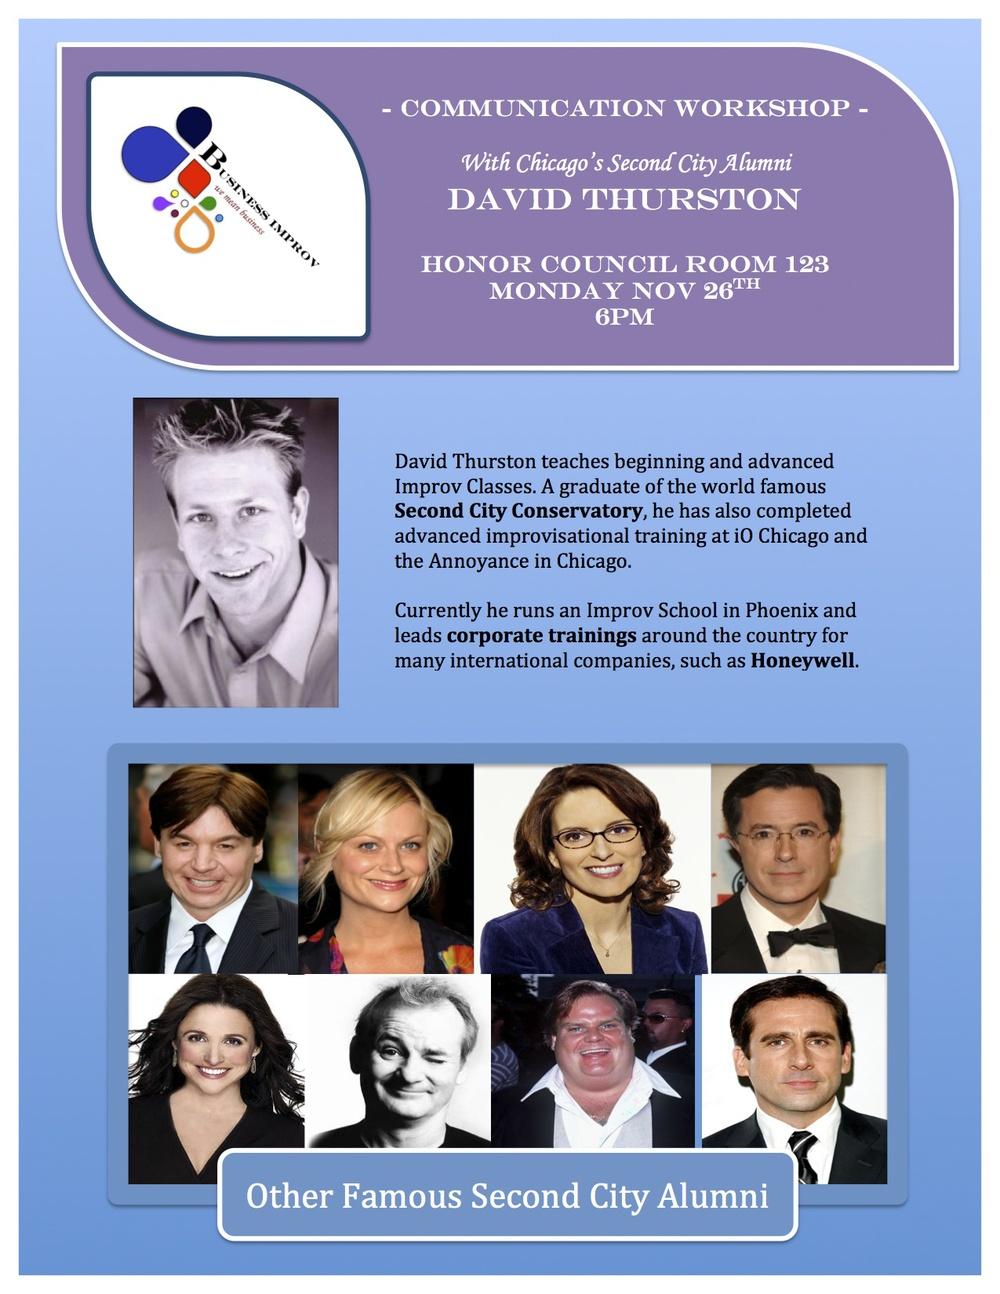 Davidthurston poster Kopie 2.jpg